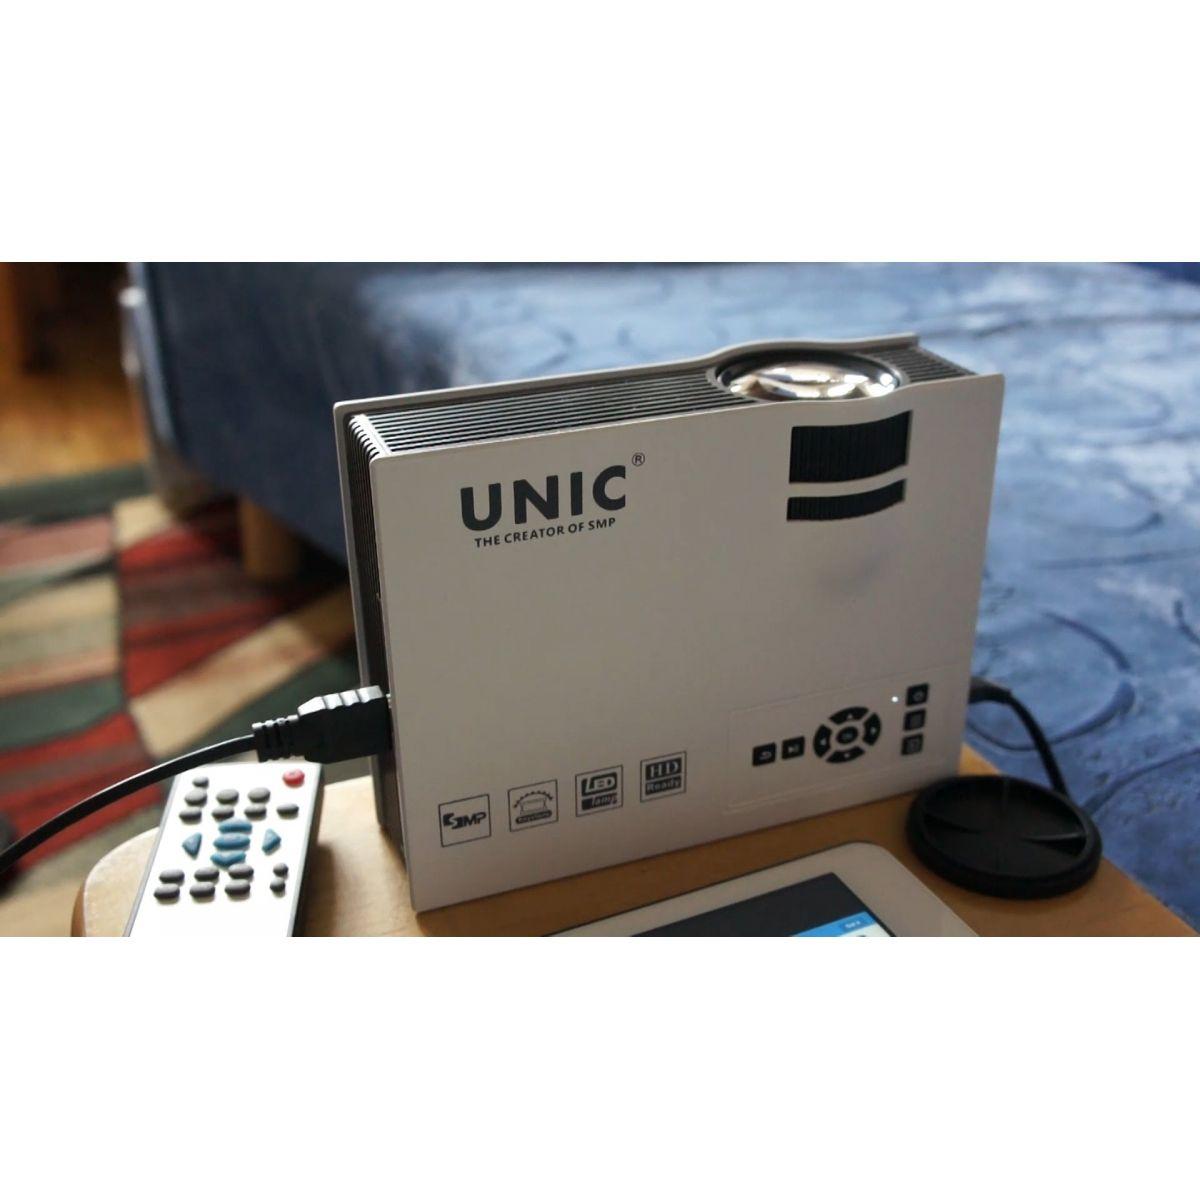 Projetor Unic Uc40 Original 800 Lumens Hdmi Mkv Usb Uniq HD Ps4 Xbox Dvix  - HARDFAST INFORMÁTICA